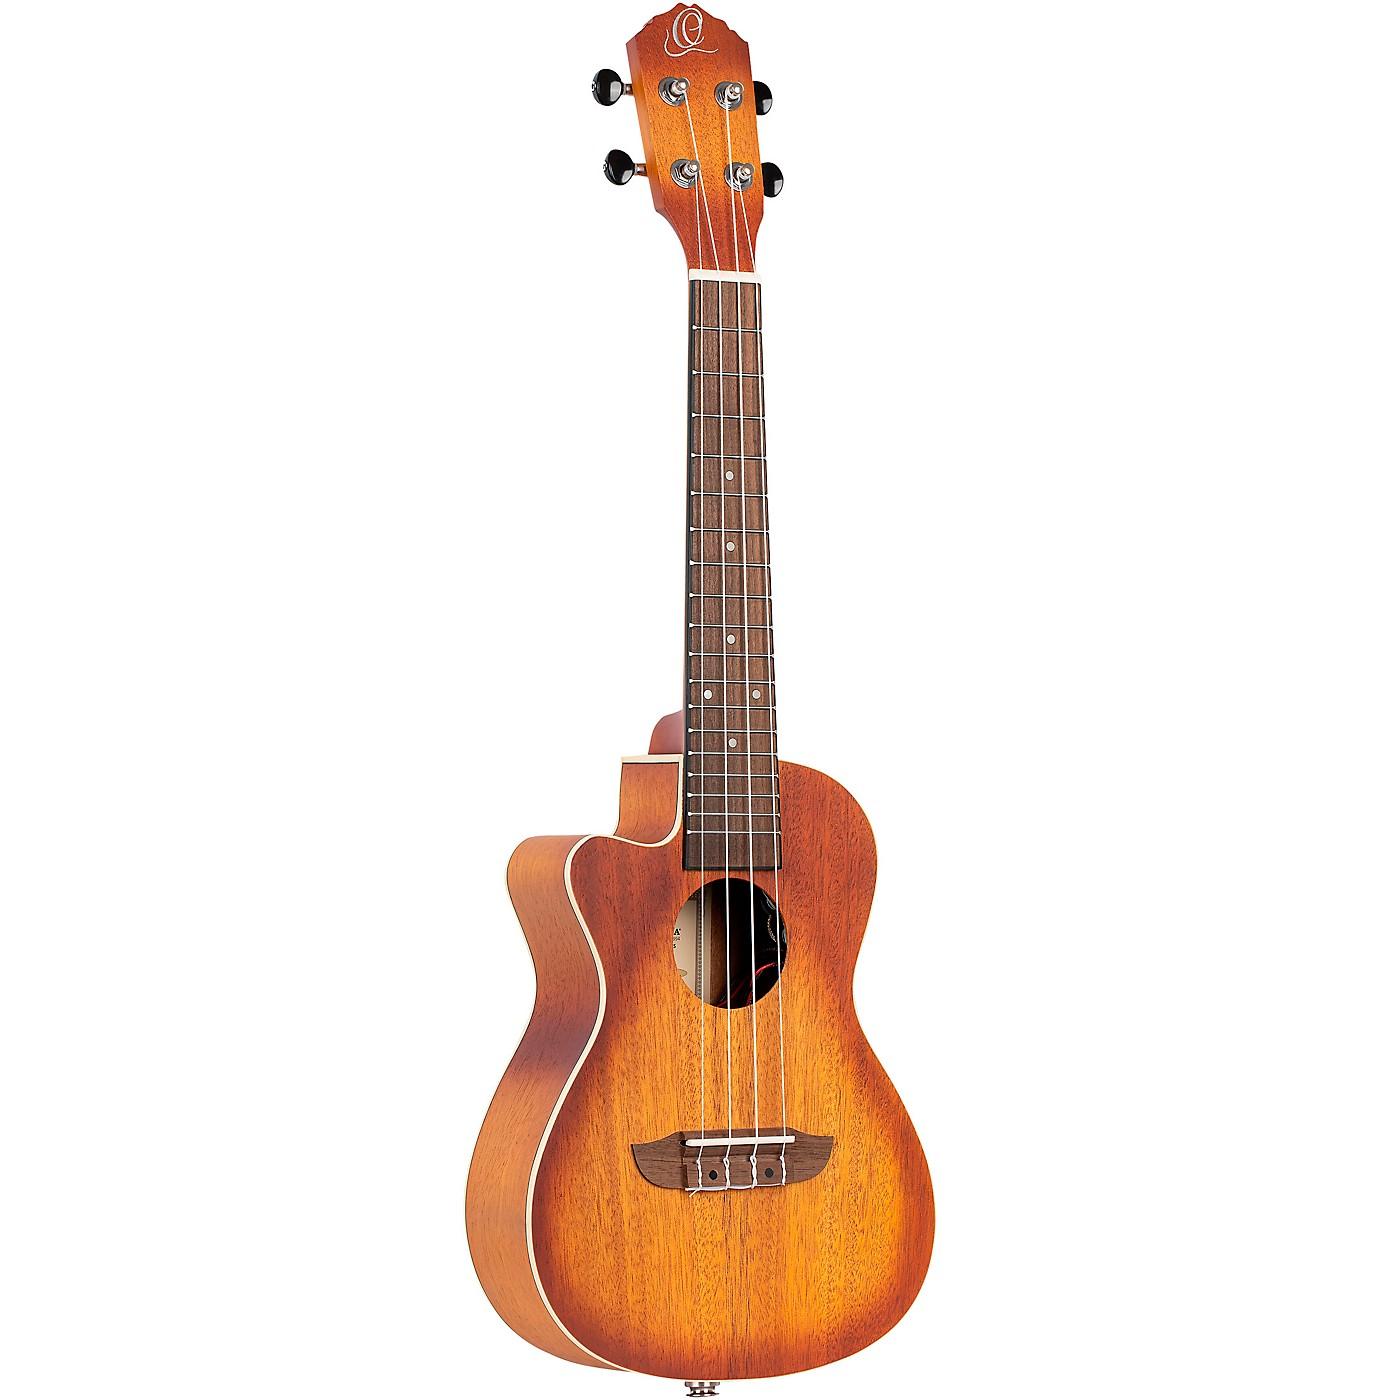 Ortega Earth Series RUDAWN-CE-L Left-Handed Acoustic Electric Concert Ukulele thumbnail